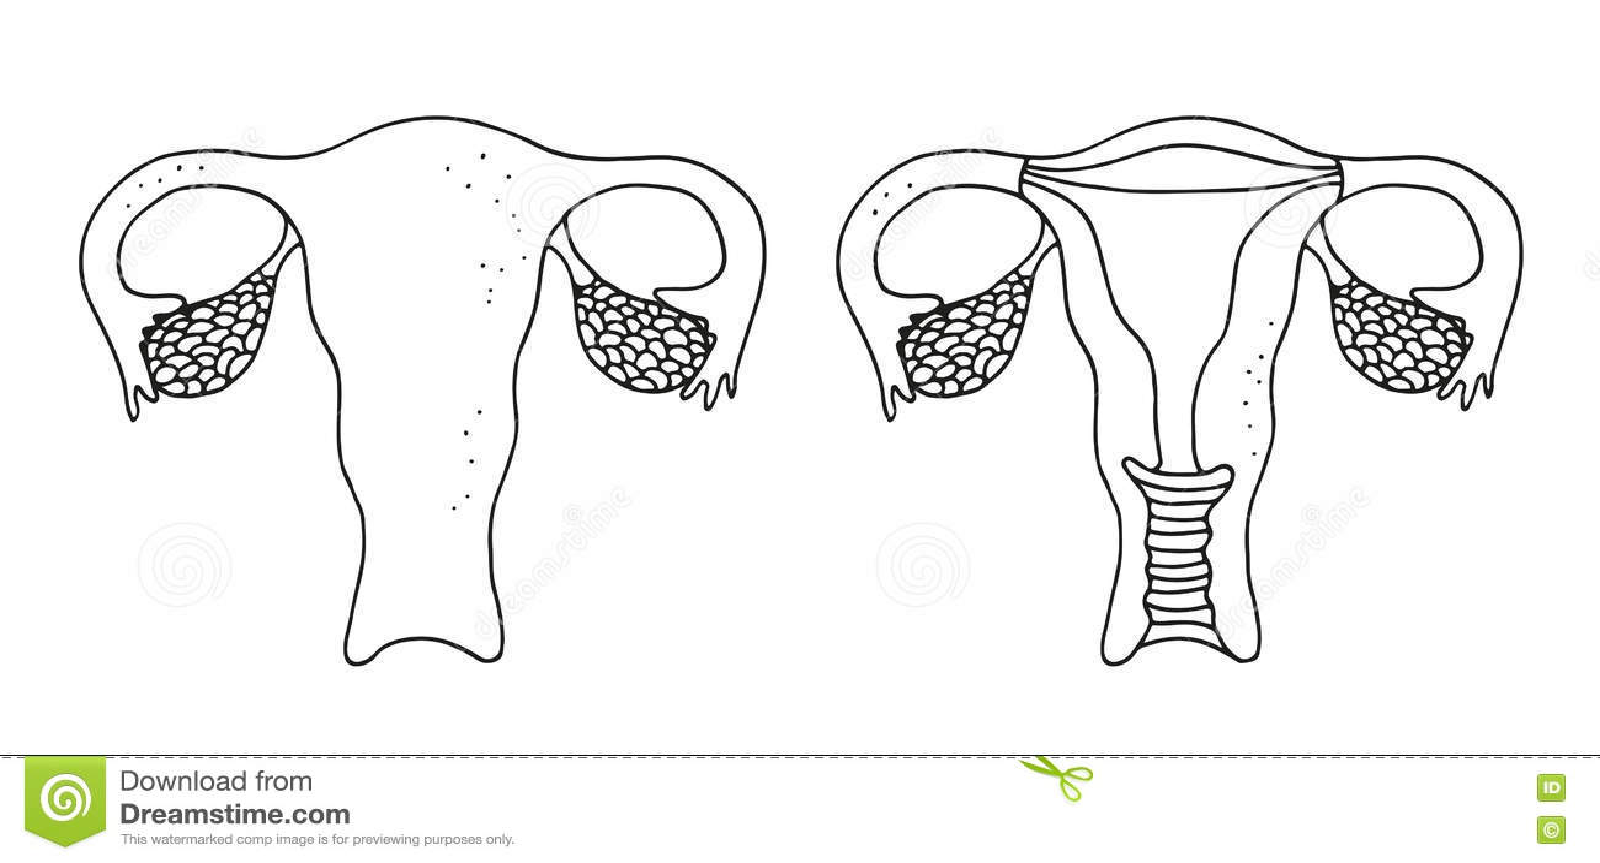 Uterus illustration stock vector. Image of human, drawn